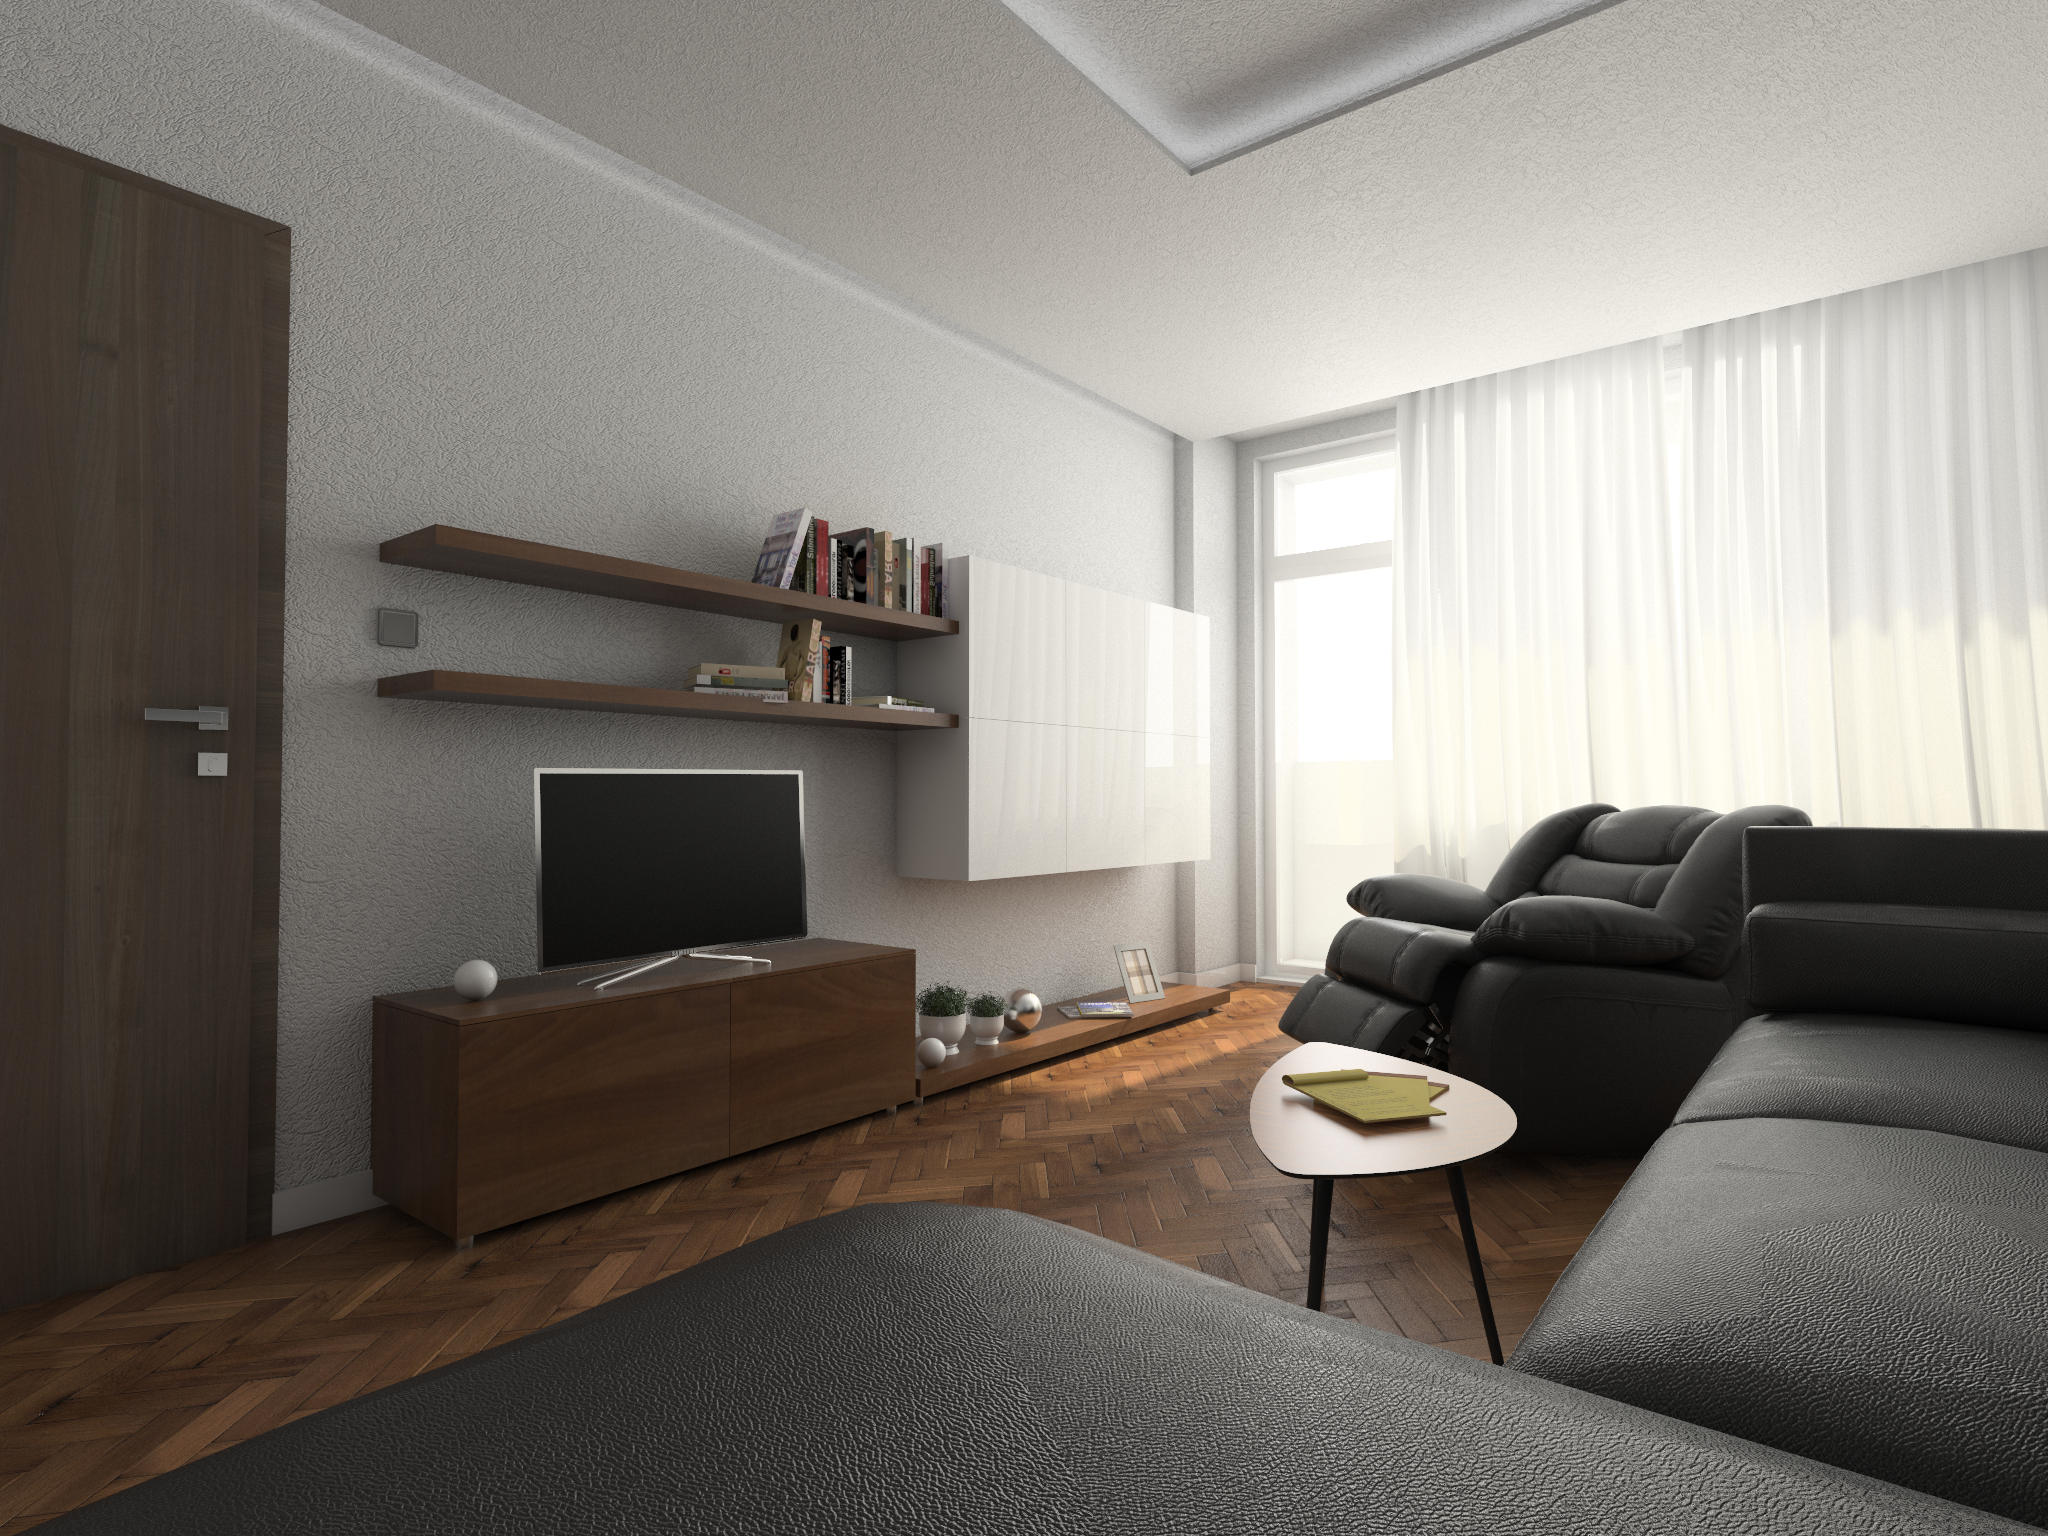 Living room, rendering, Banishora, Sofia